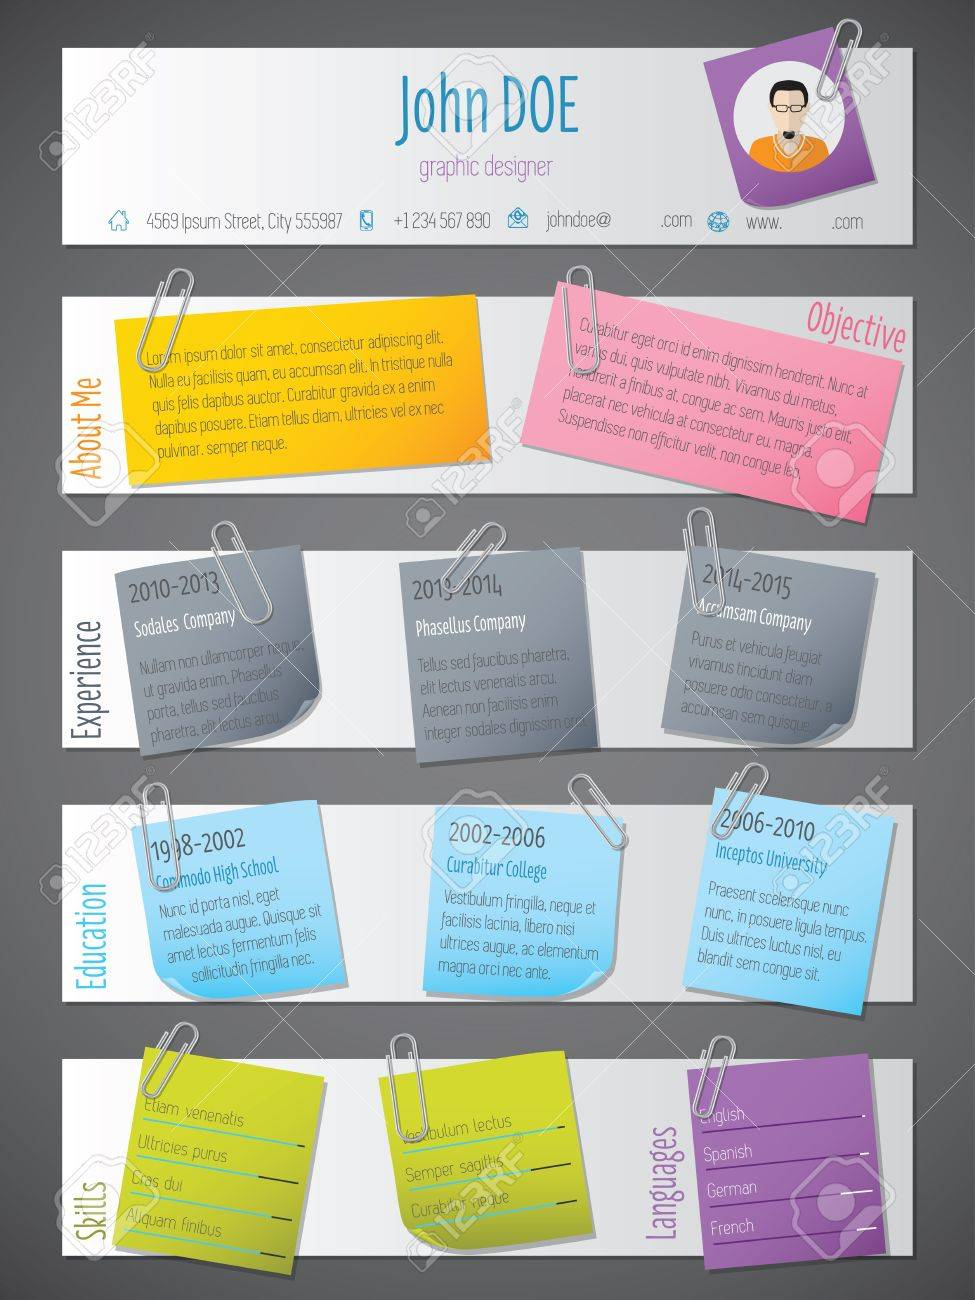 Modern Resume Cv Curriculum Vitae Template Design With Notices